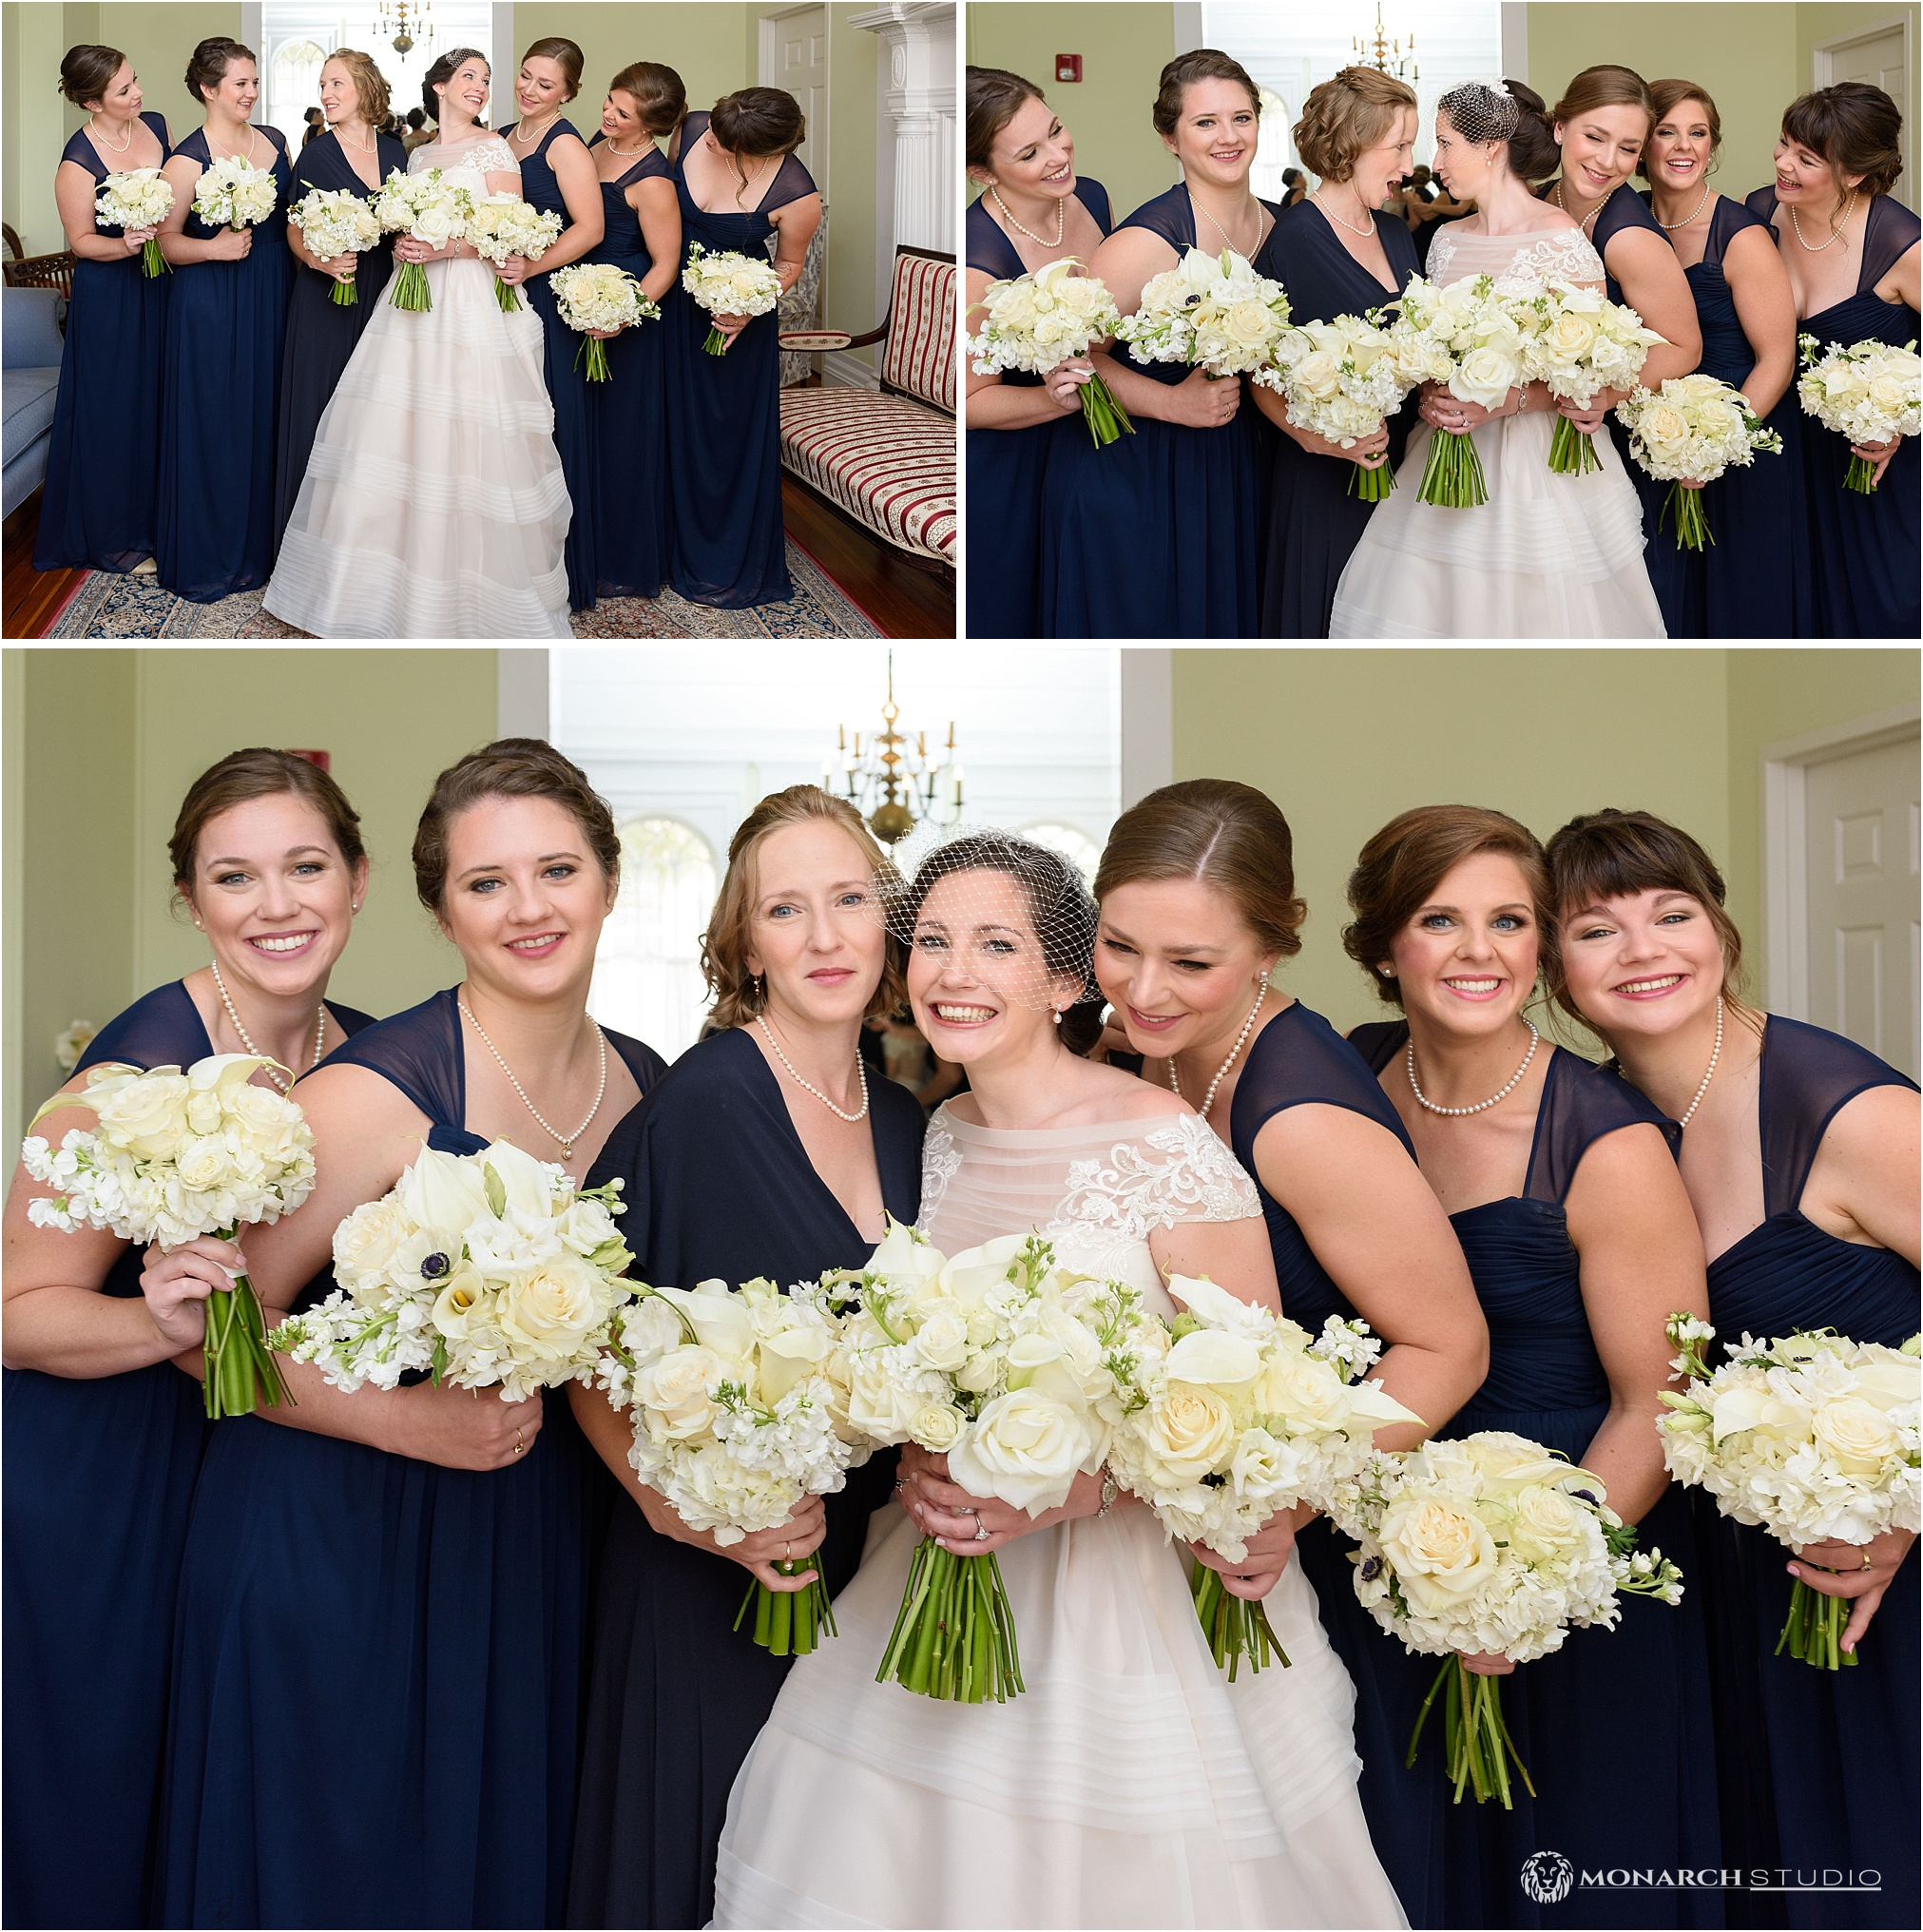 026-st-augustine-wedding-photographer-.jpg